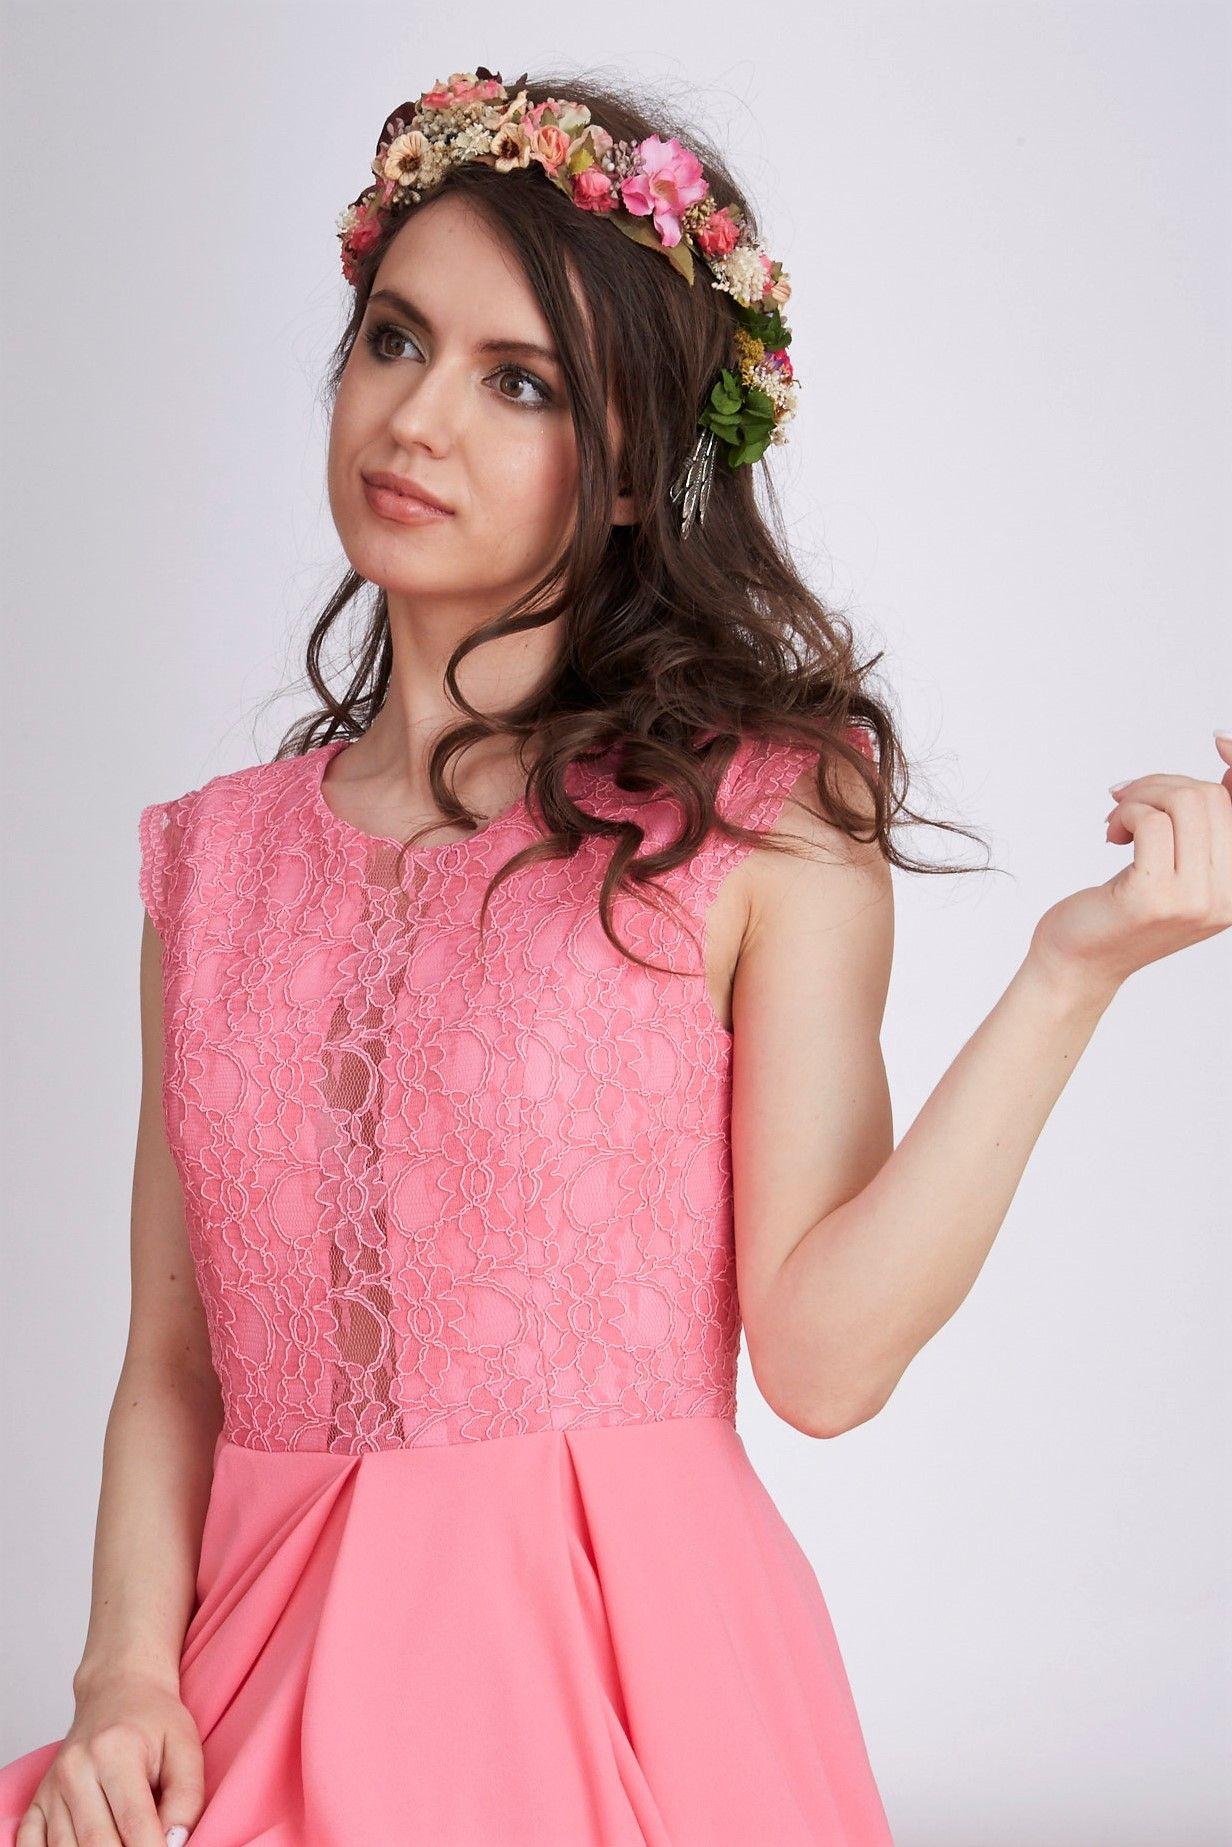 The Christy Mini Dress - Lace Millennial pink dress | Vestido corto ...